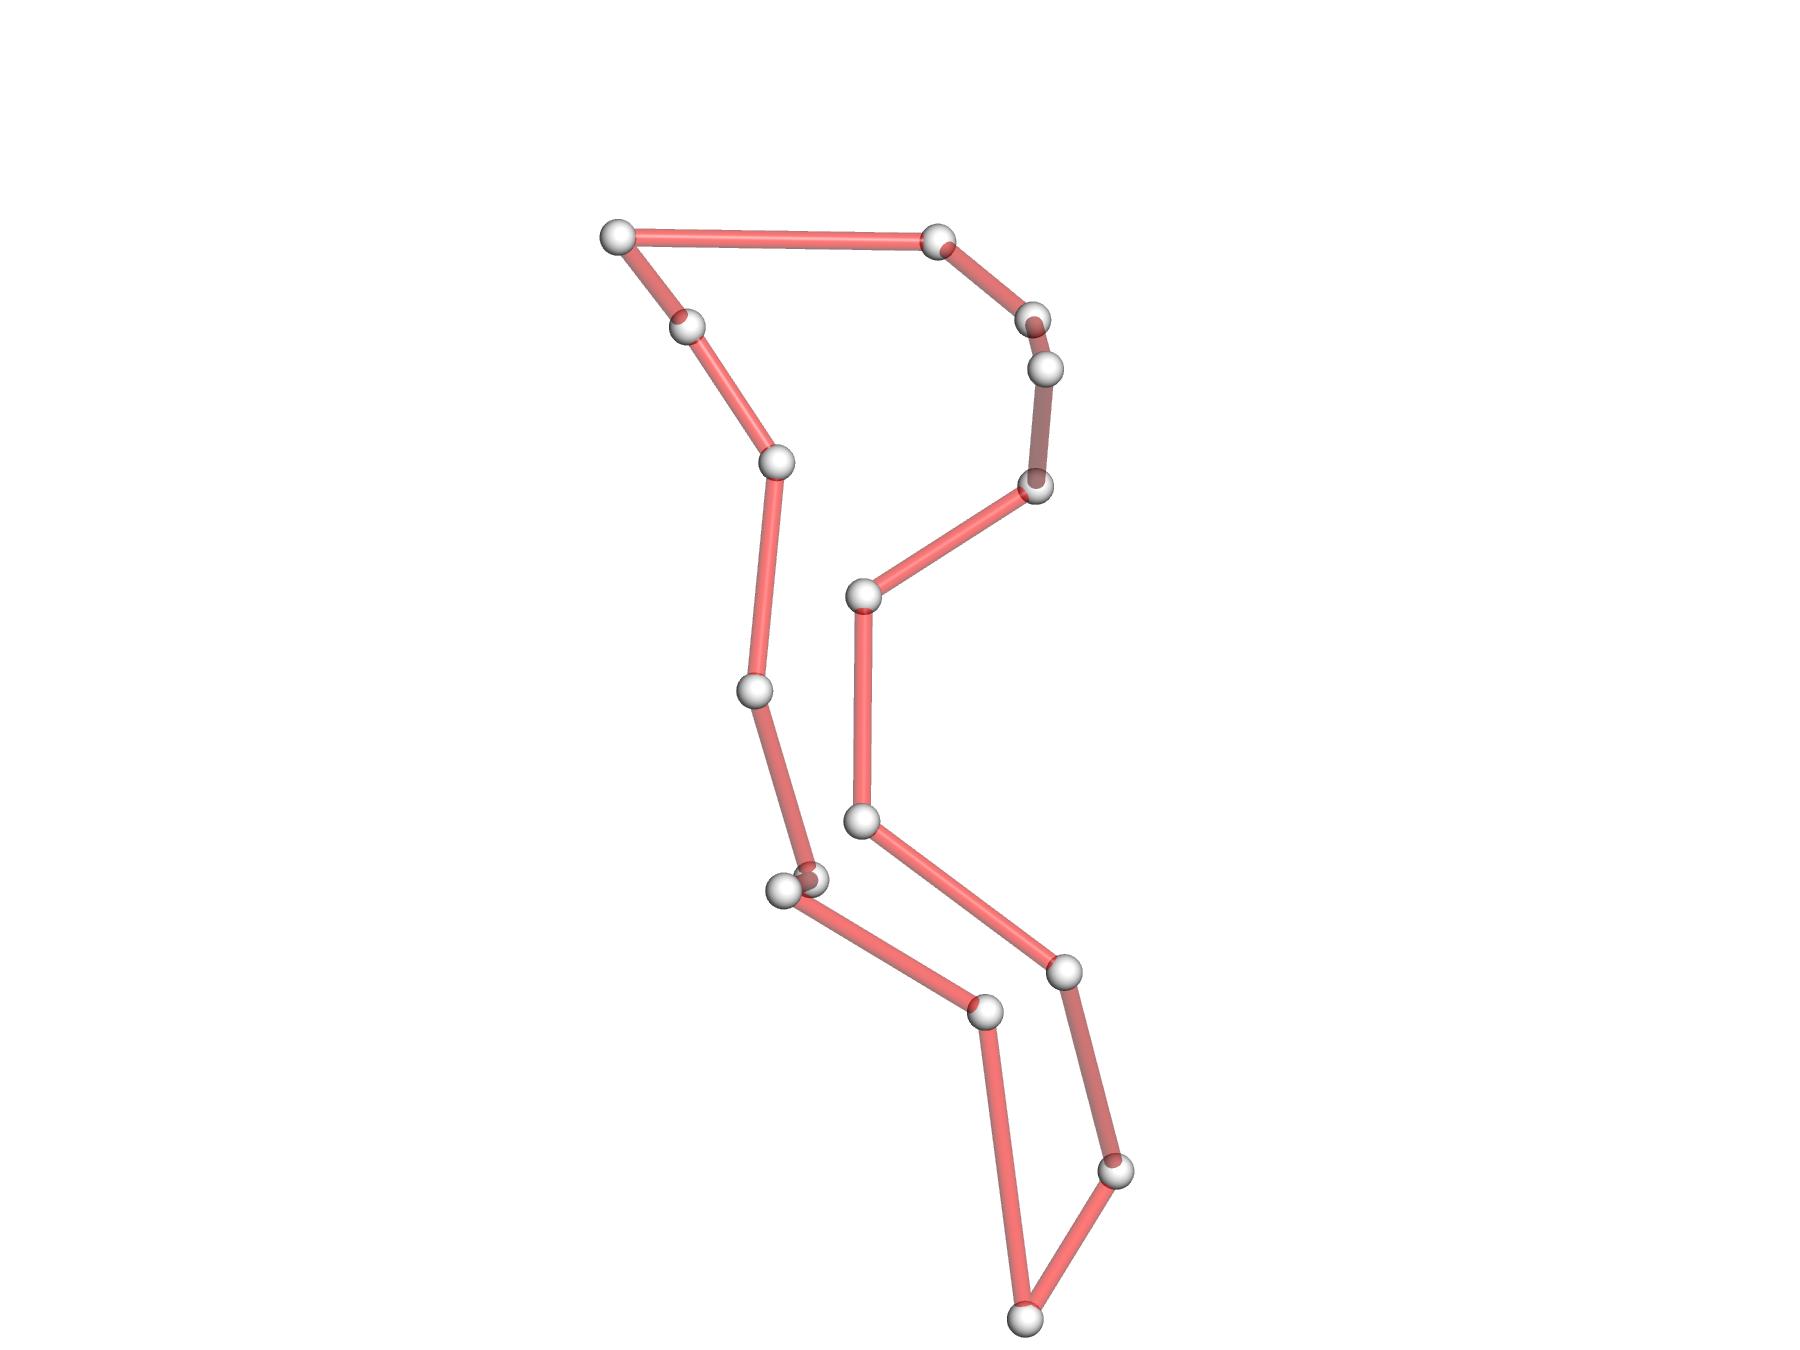 """tRNA 1ehz 4-way junction loop in 3D from PyMOL"" title=""tRNA 1ehz 4-way junction loop in 3D from PyMOL"""